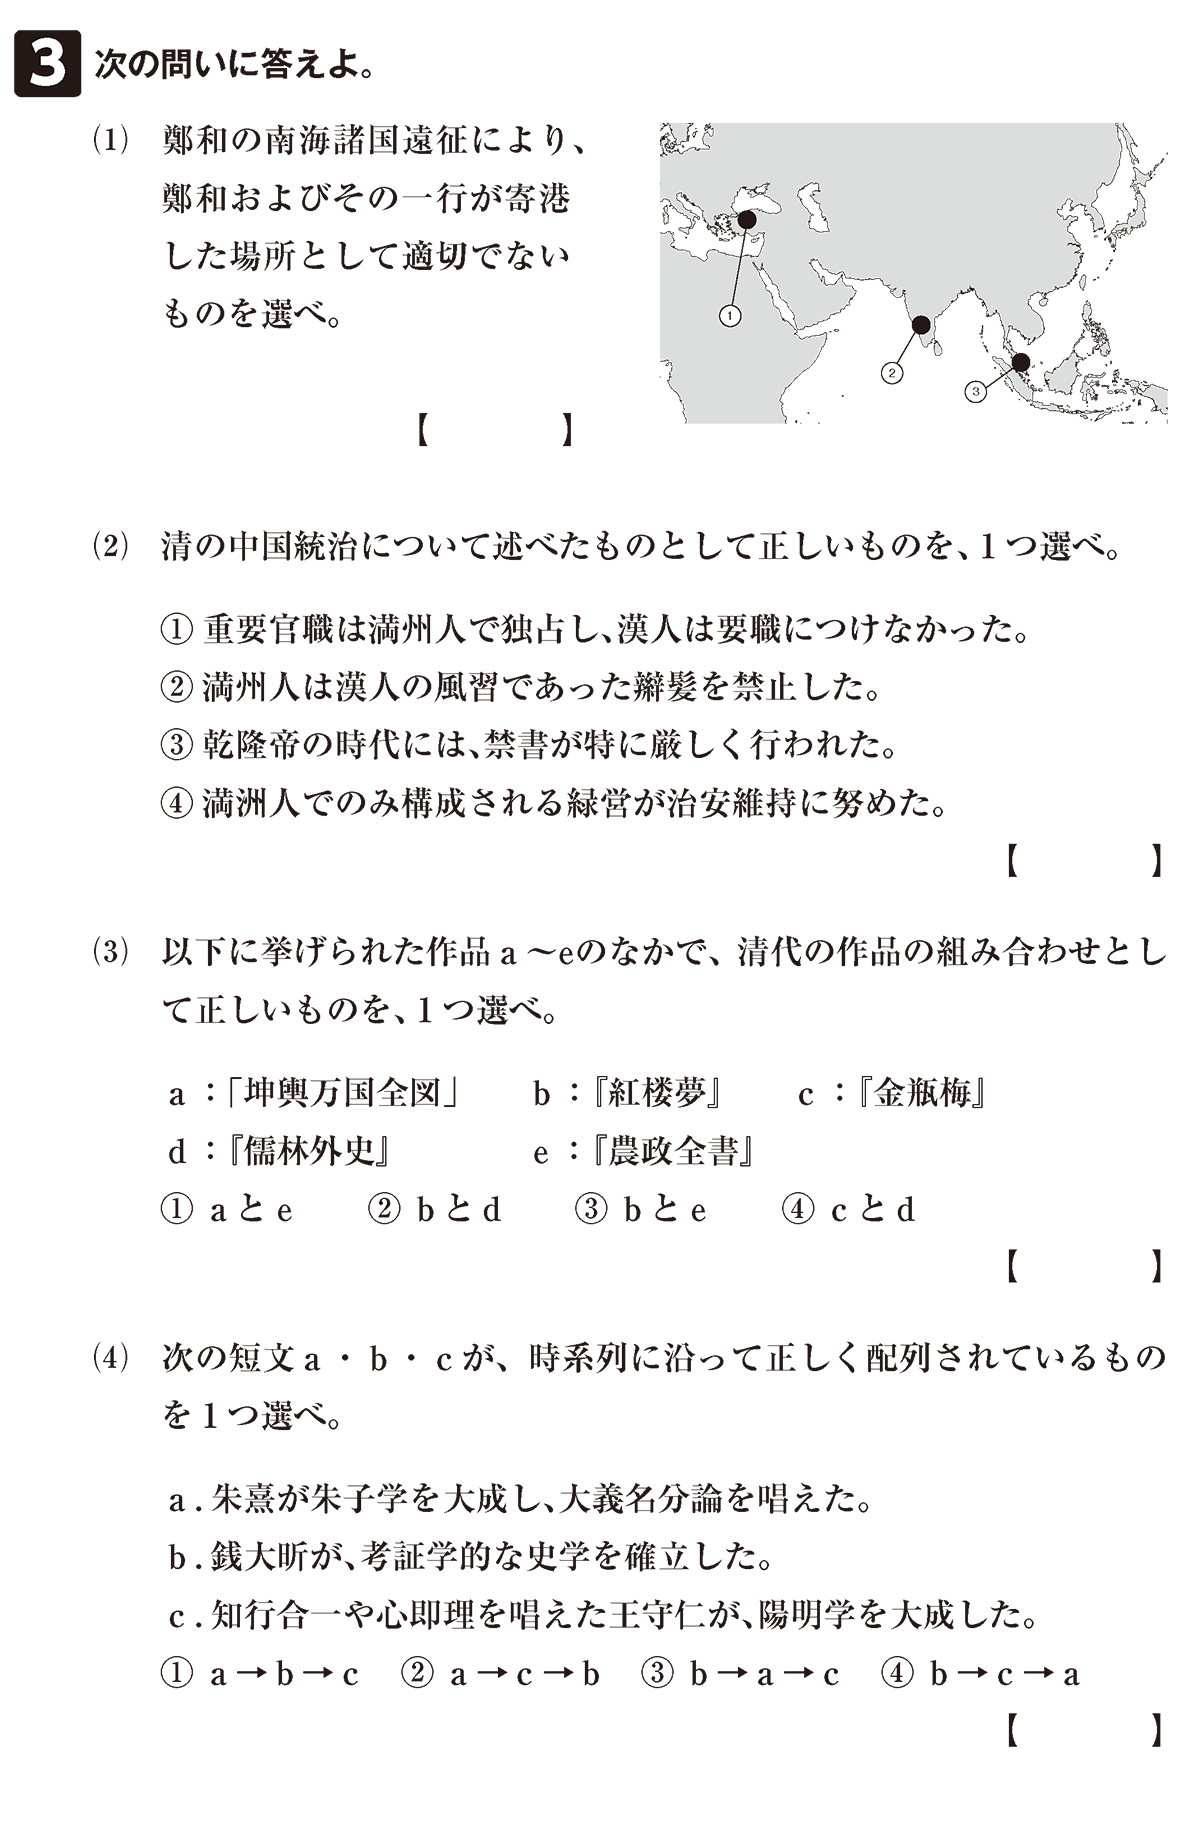 高校世界史 明・清の時代9 確認テスト(後半)問題3